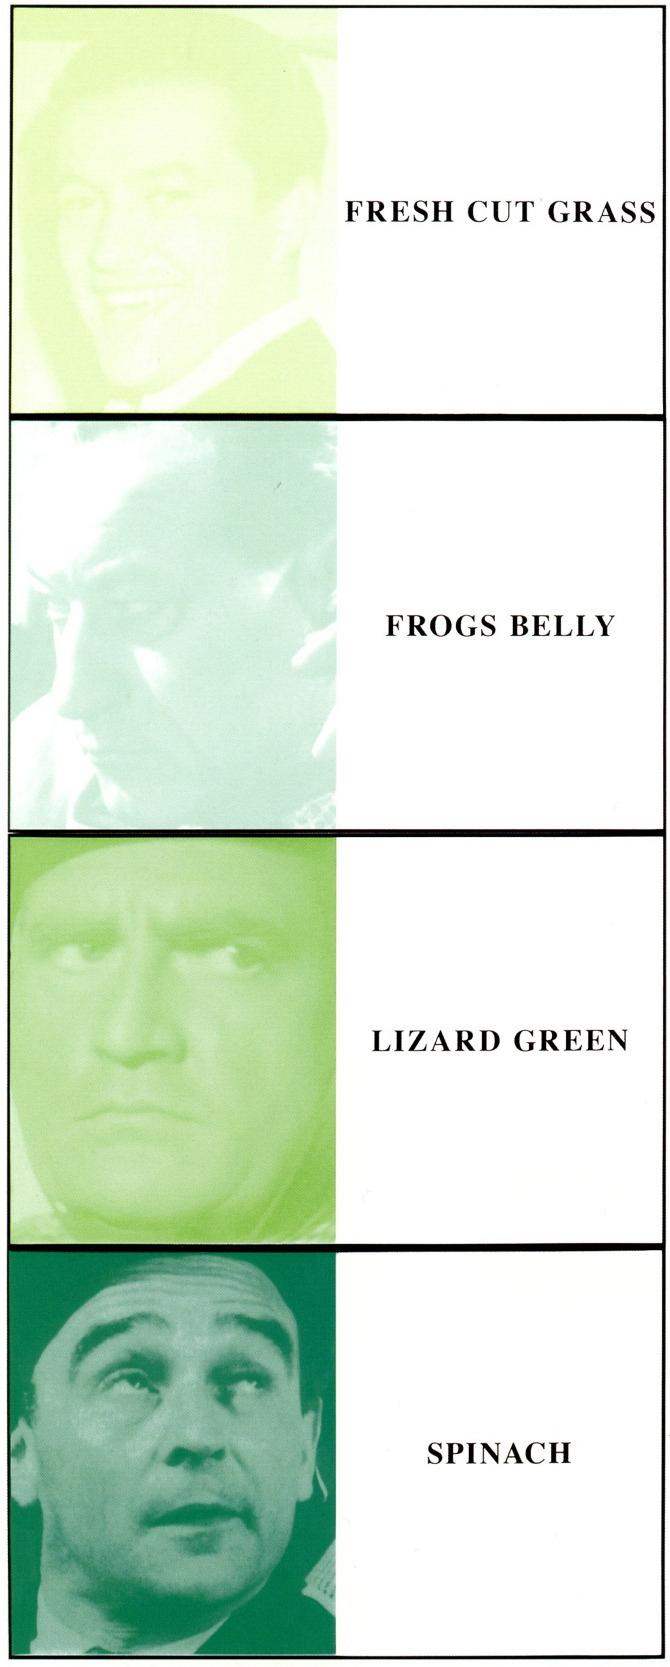 John Baldessari, Prima Facie (Fifth State) Fresh Cut Grass/Frogs Belley/Lizard Green/Spinach (in 4 parts), 2005